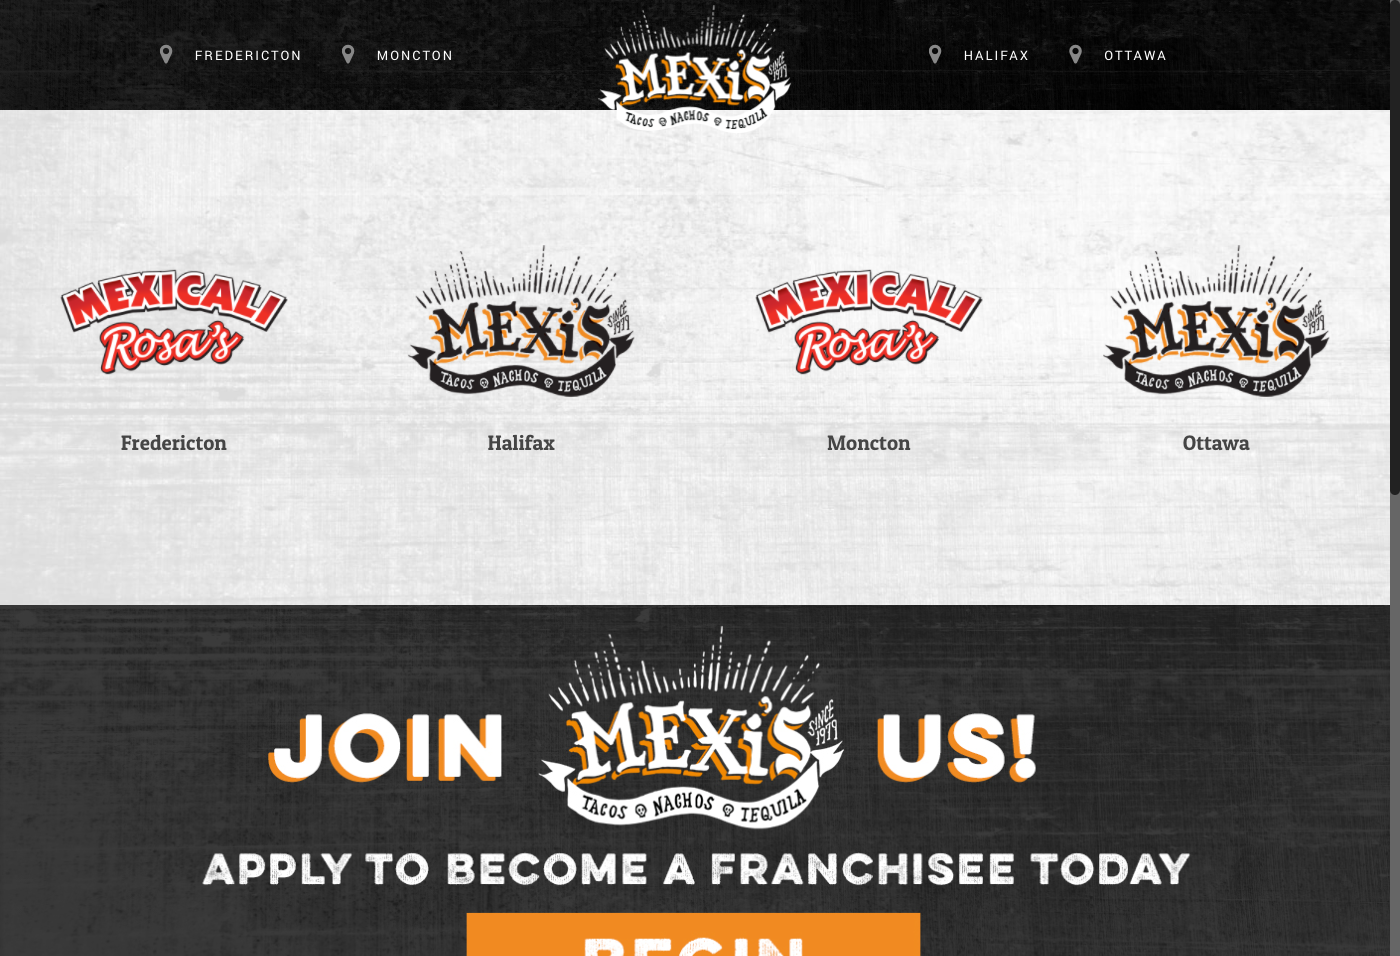 mexis-1